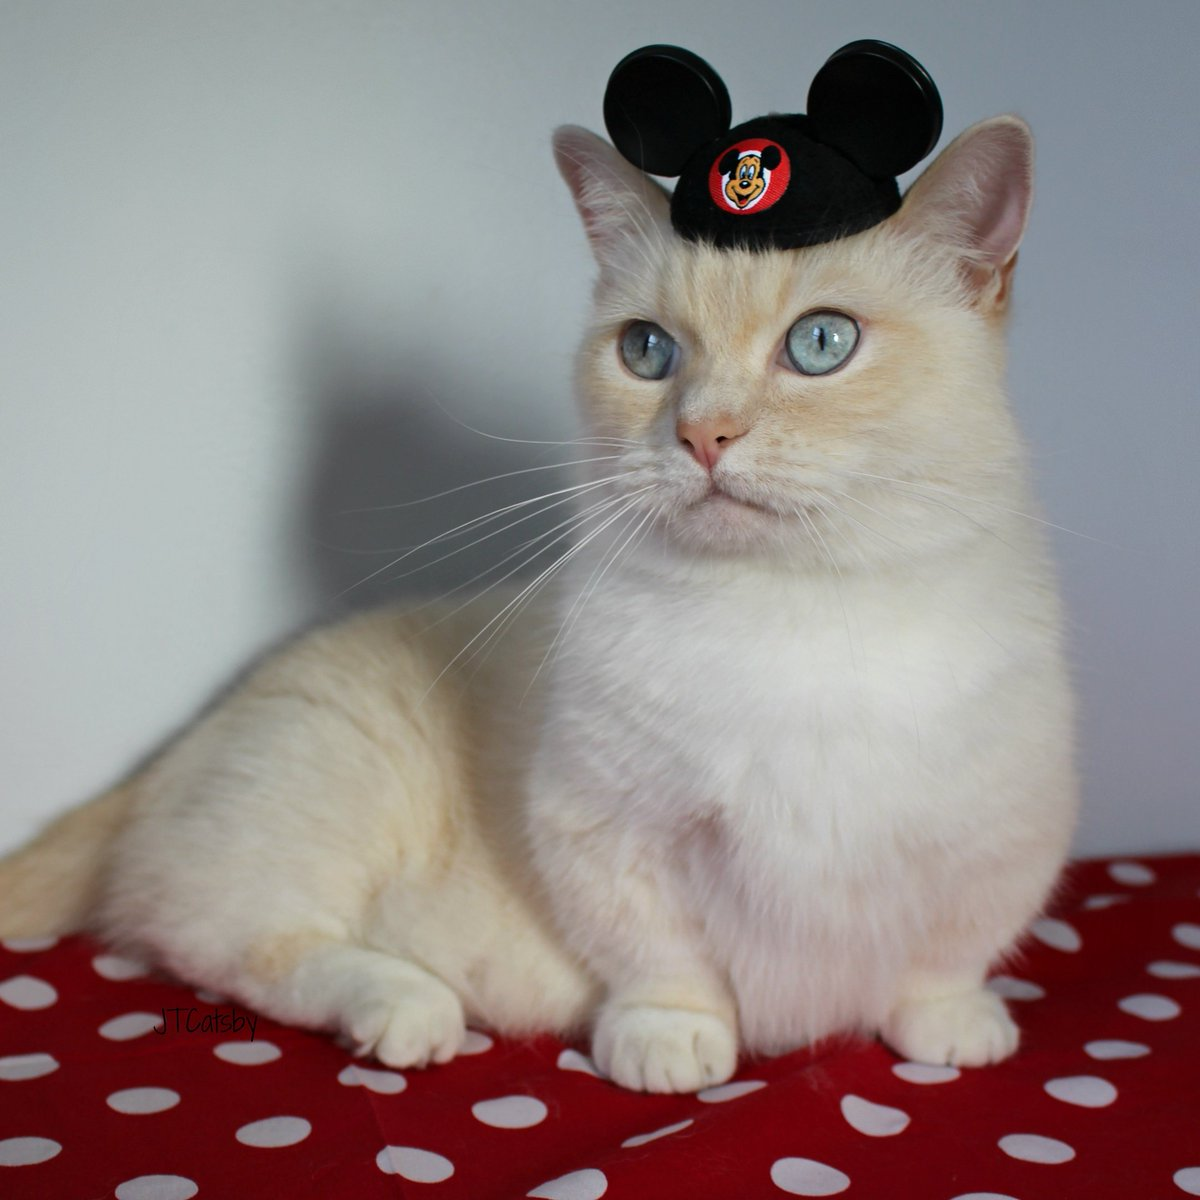 It&#39;s #NationalPolkaDotDay ! JT Catsby loves his Disney dots! #RocktheDots #polkadotday #disneyside #disneybound  #sothisislove  #JTCatsby<br>http://pic.twitter.com/gP1HDKygEe